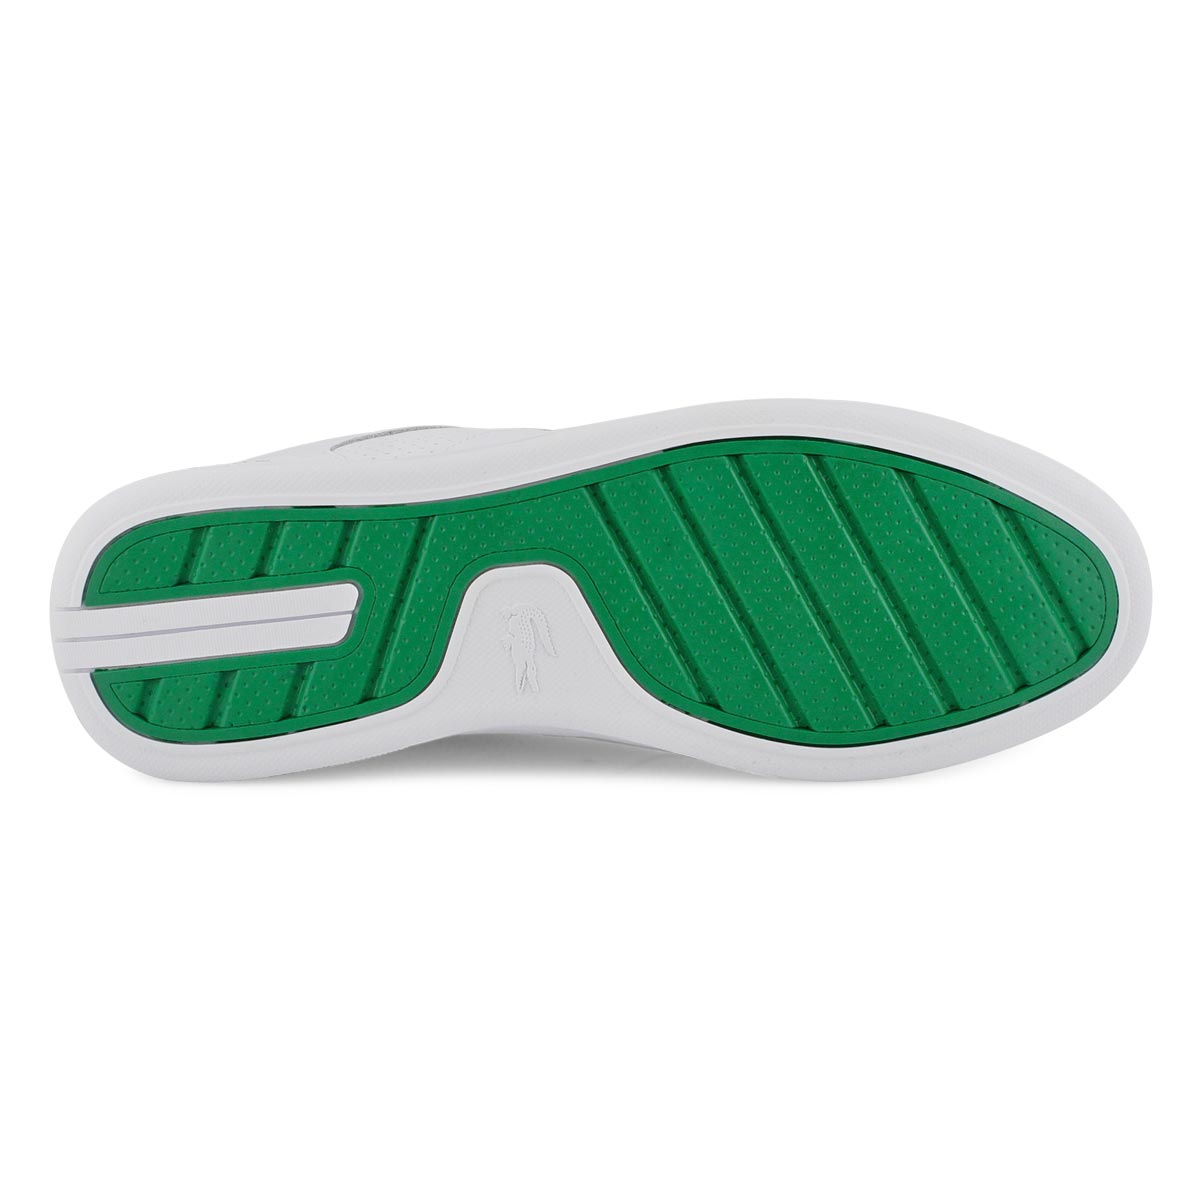 Men's Novas 120 1P SMA Sneaker - White